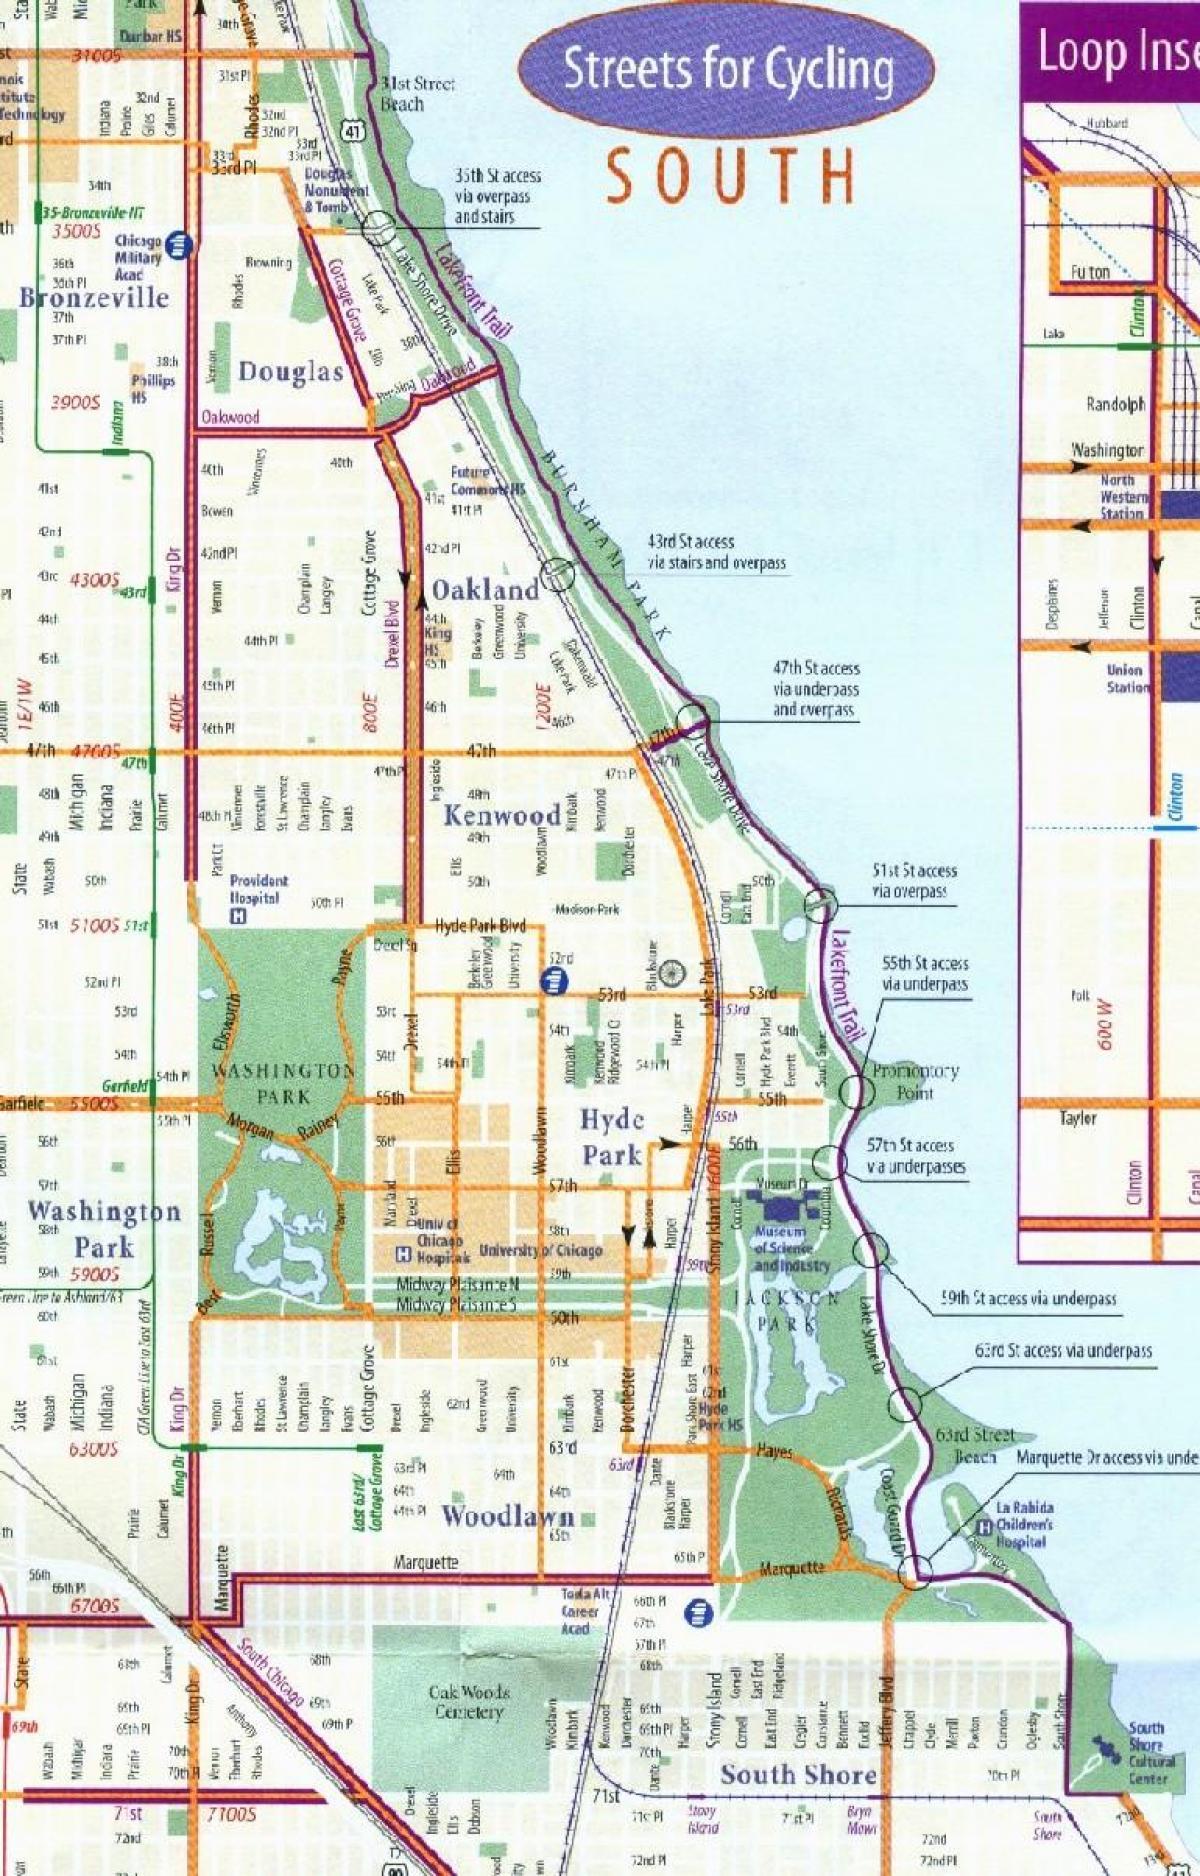 Chicago bike map Chicago bike lane map United States of America